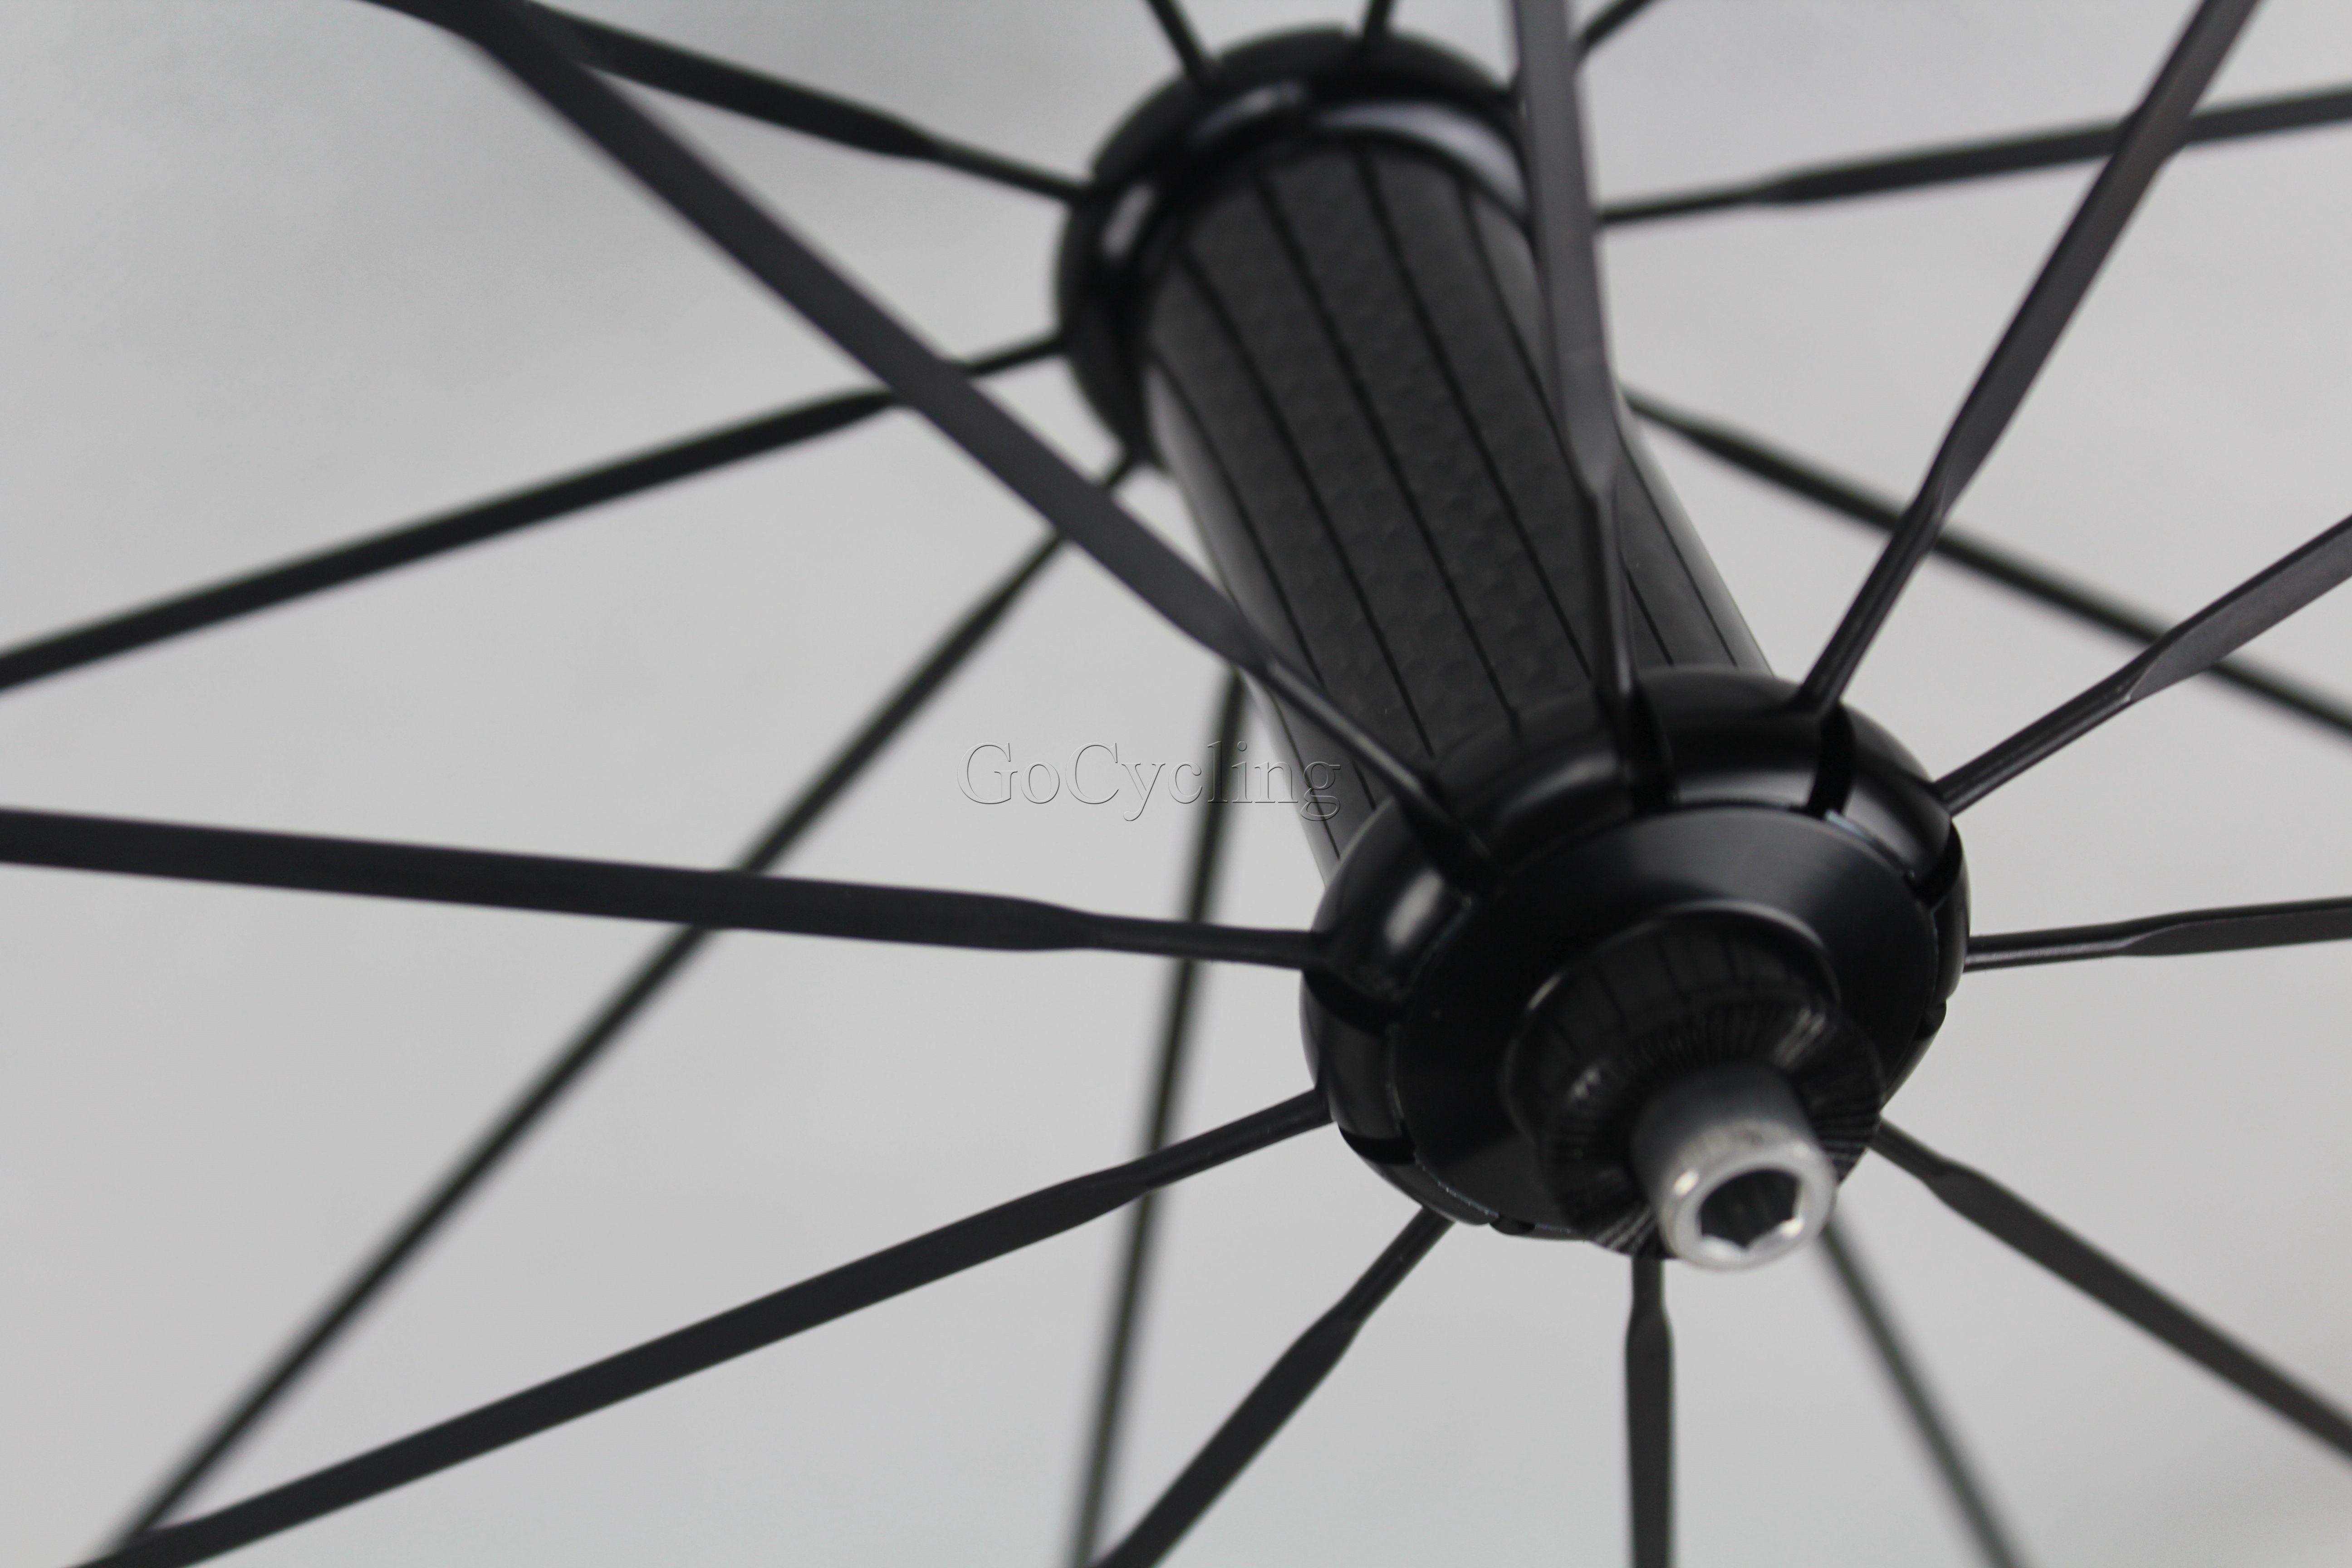 Carbon bike road wheels rim depth 30mm width 25mm clincher tubular road bicycle wheelset basalt braking surface powerway r36 carbon hubs